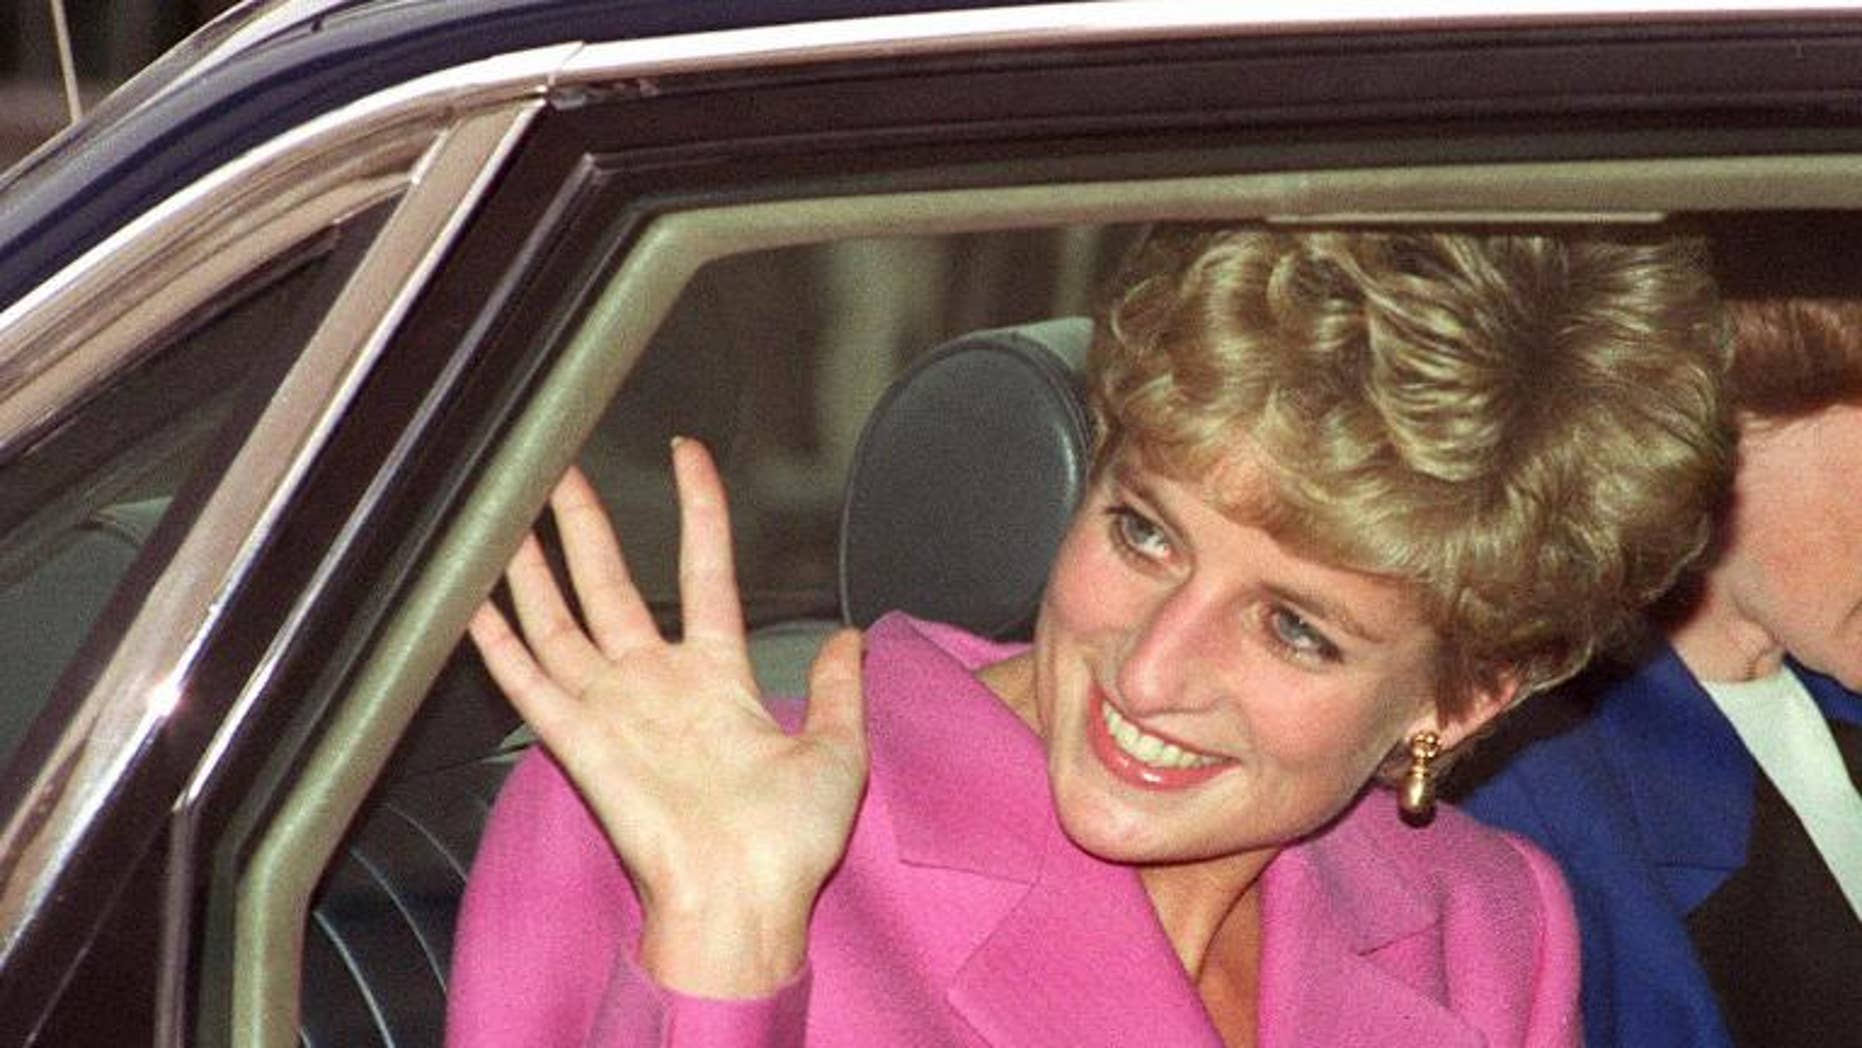 Diana, Princess of Wales waves to the crowd as she arrives at the Cite de la Musique at La Villette in Paris on November 14, 1992